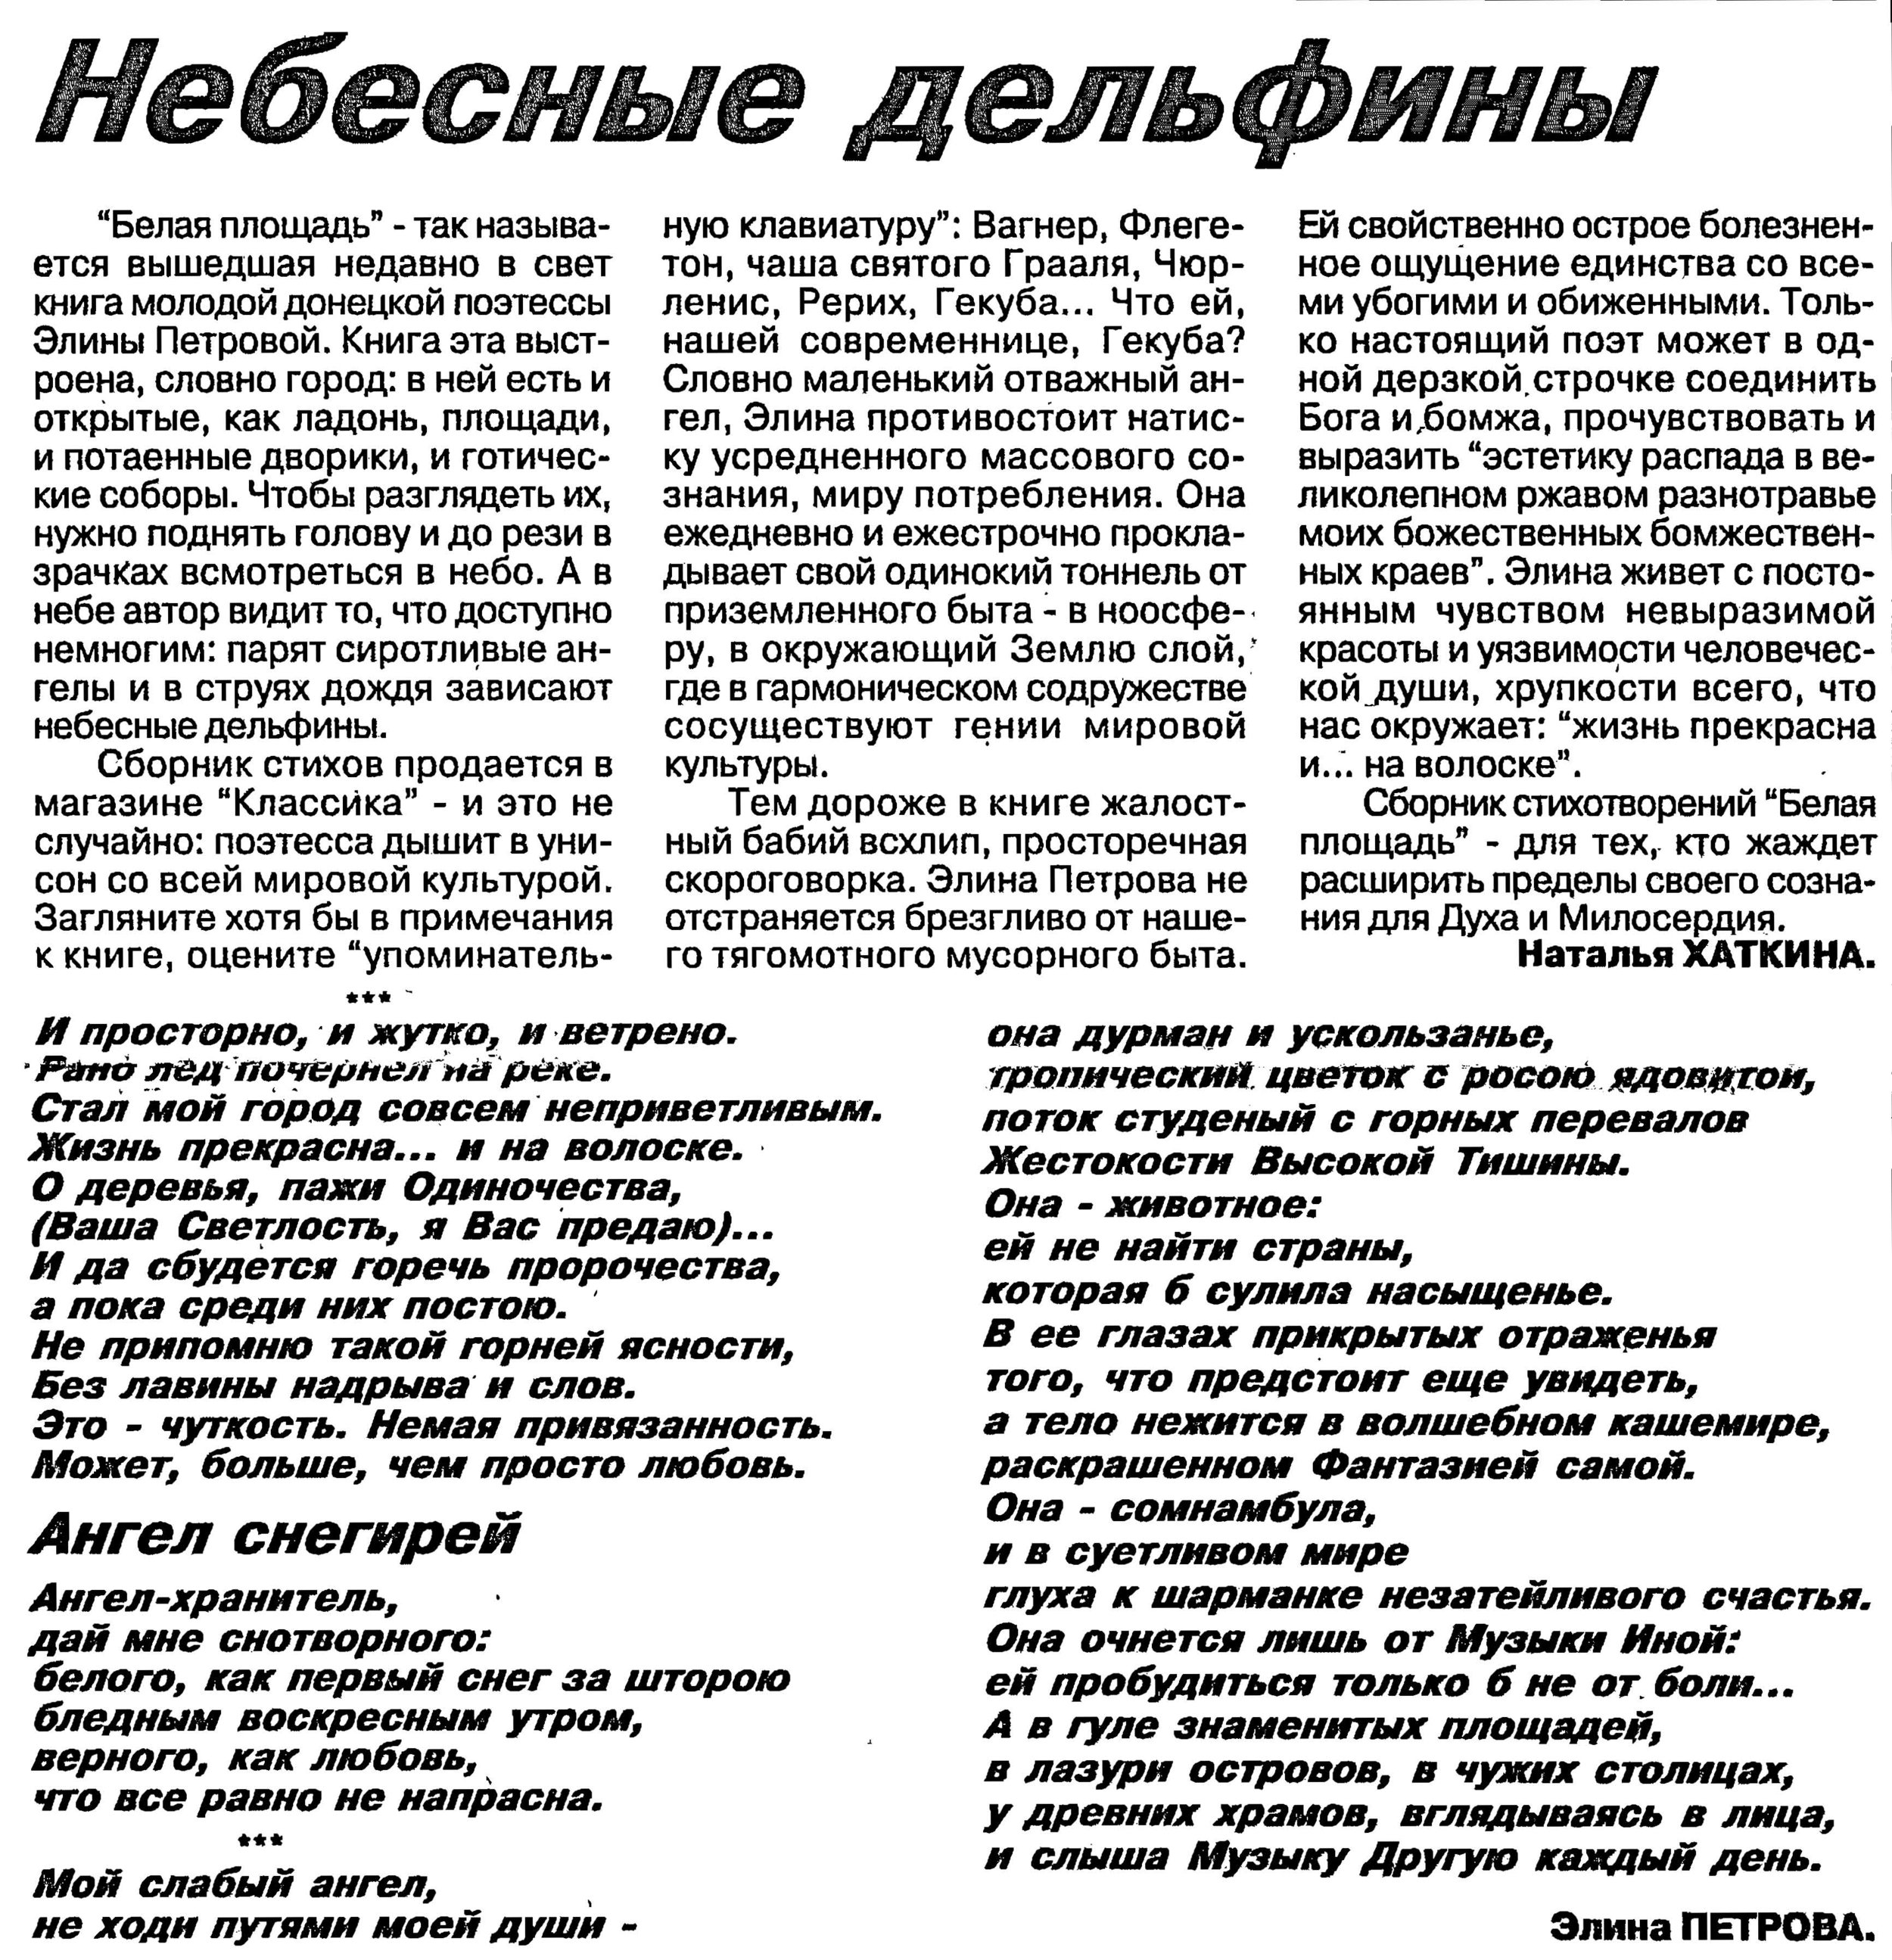 1. Evening Donetsk, Khatkina. March 13,1999.jpg